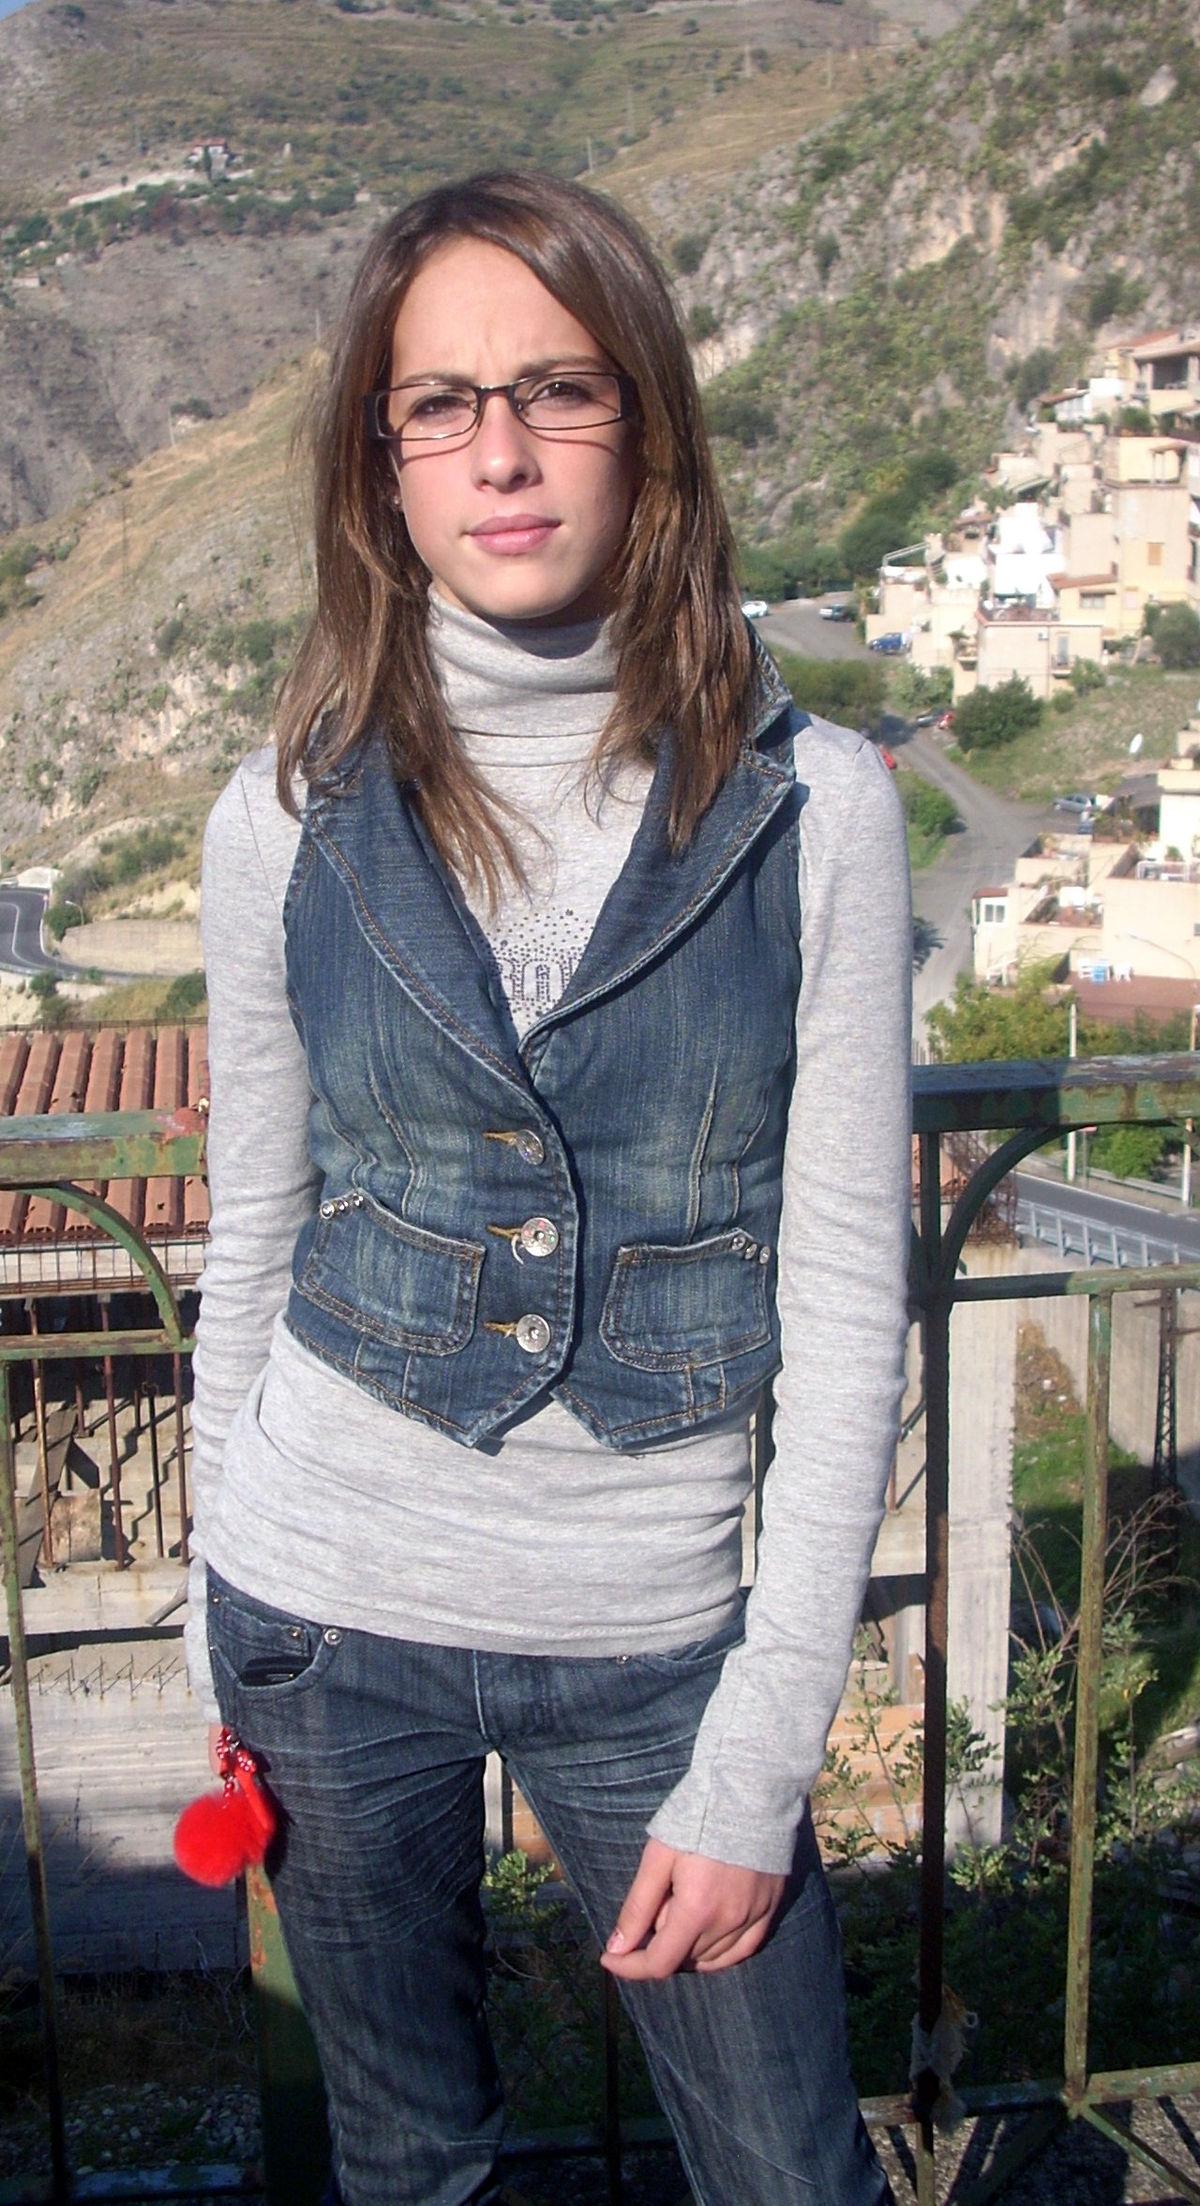 Young girl denim waistcoat.JPG